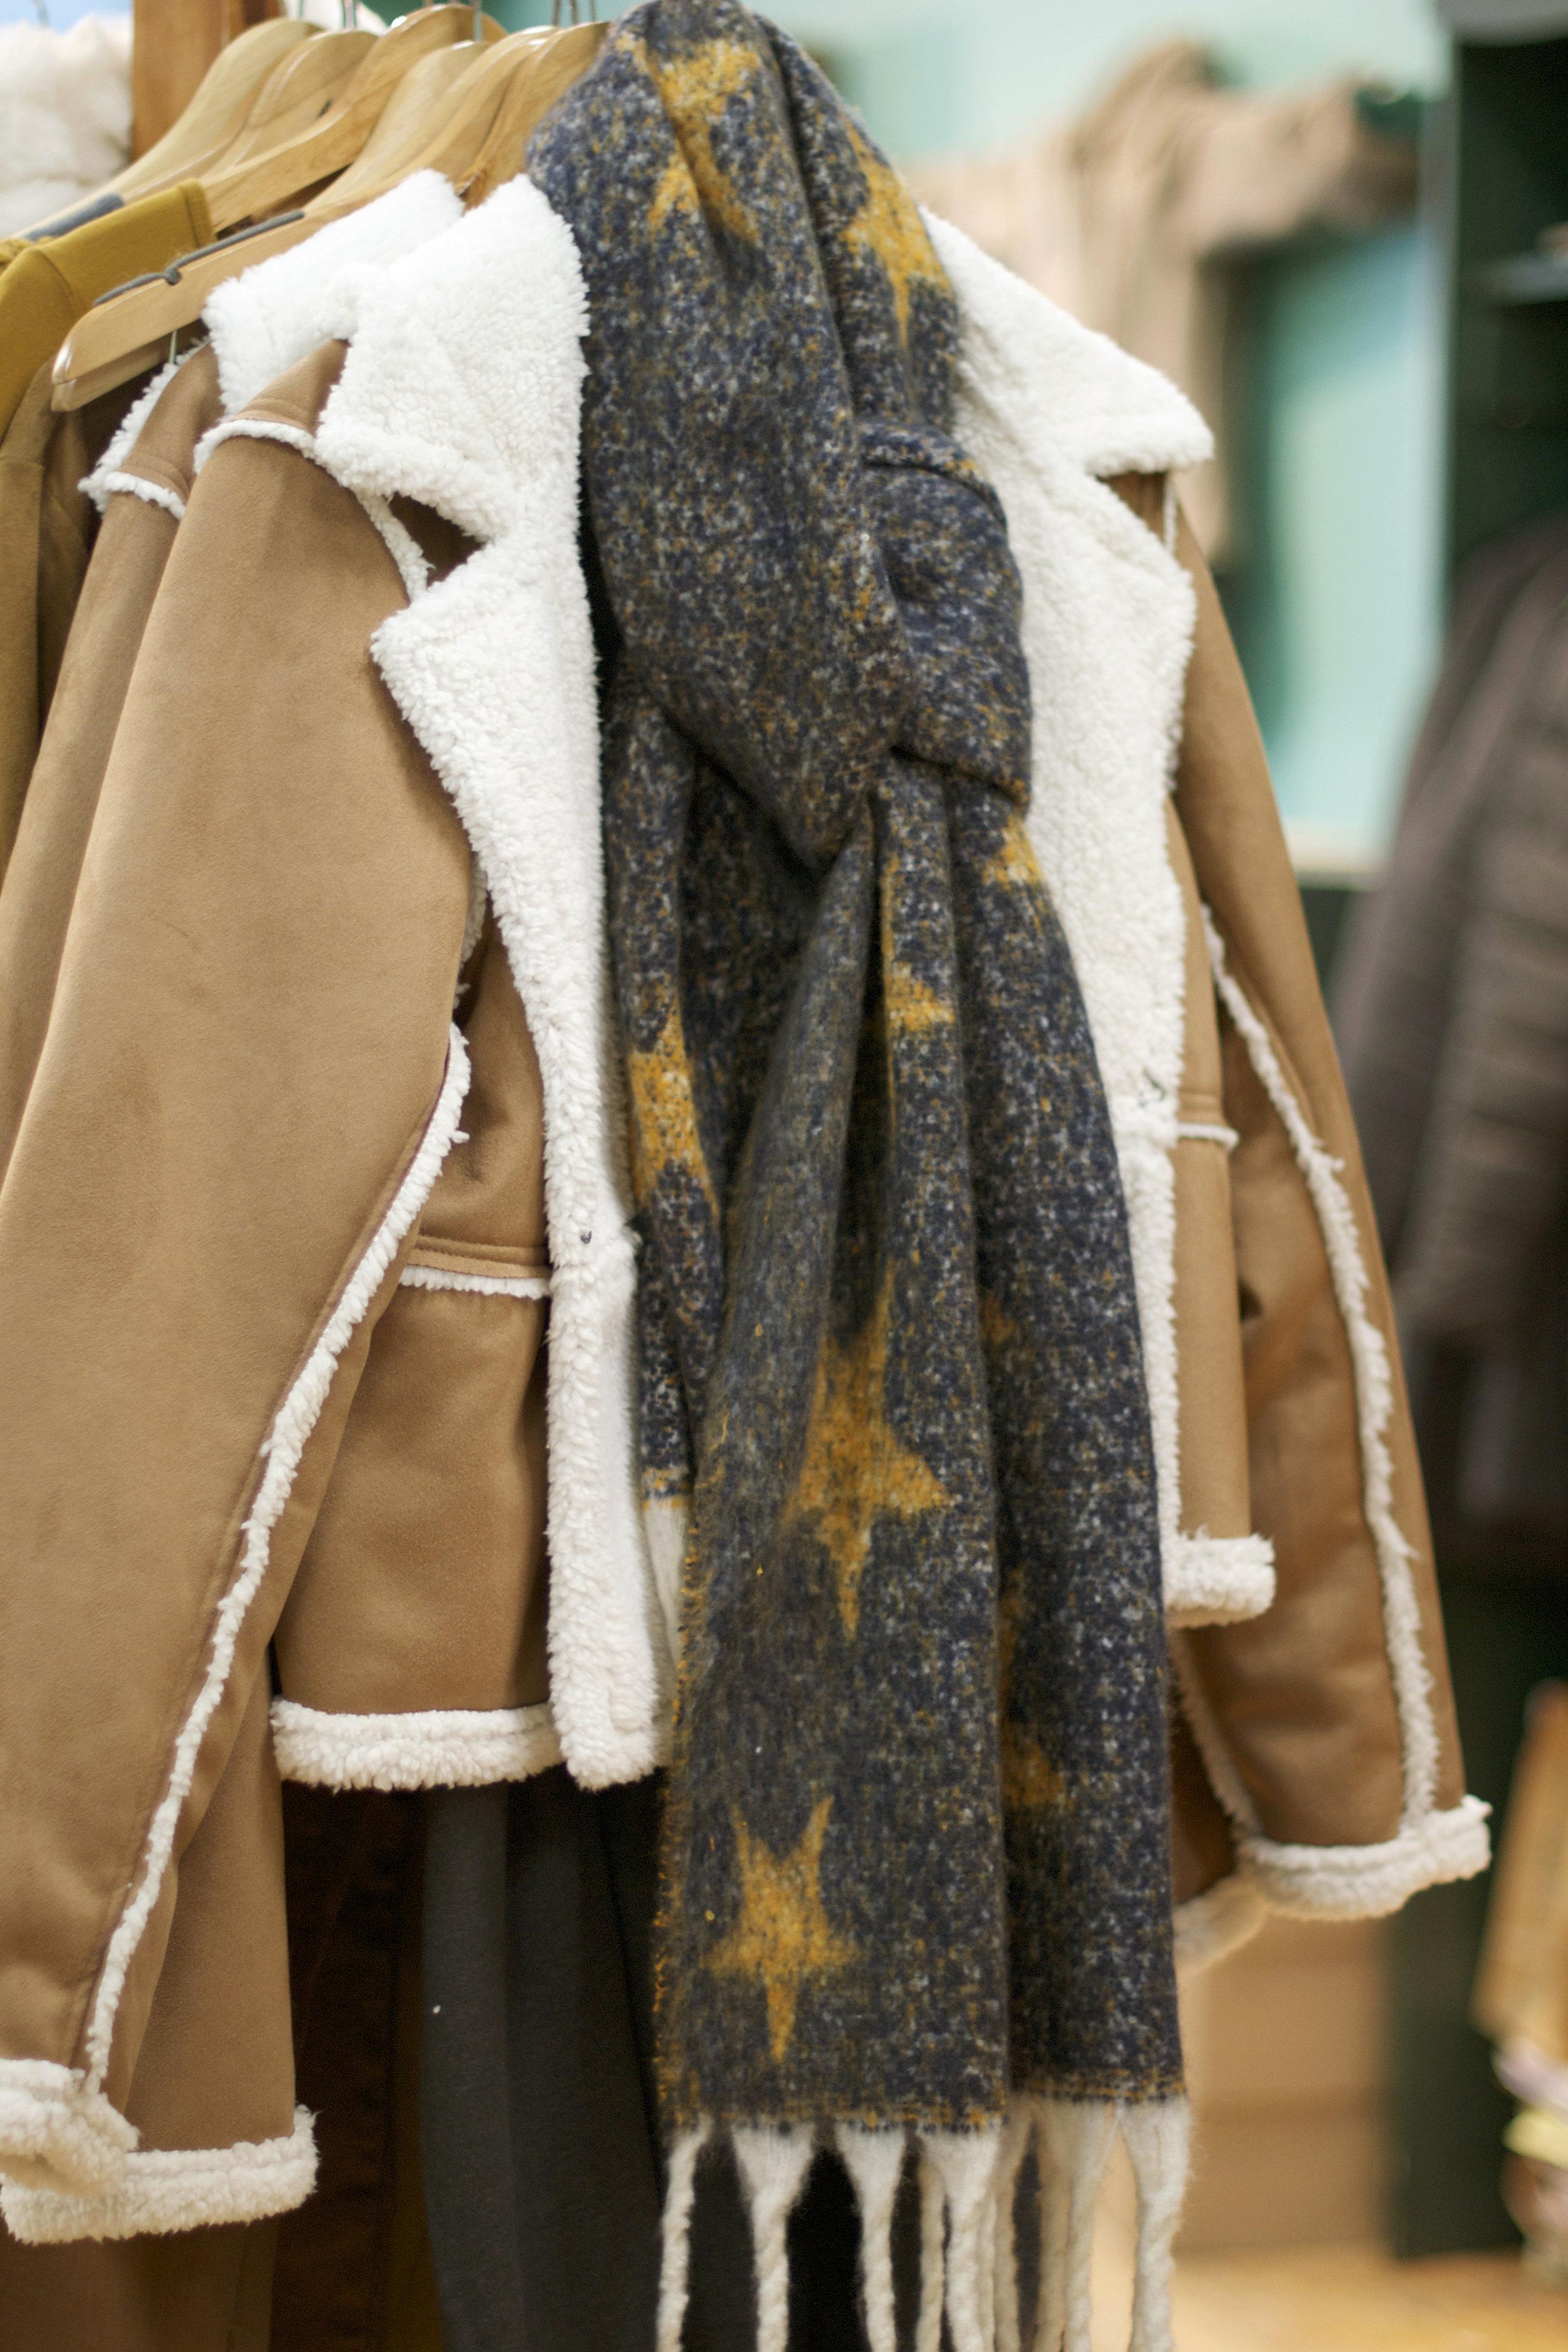 shearling-jacket-and-star-scarf.jpg